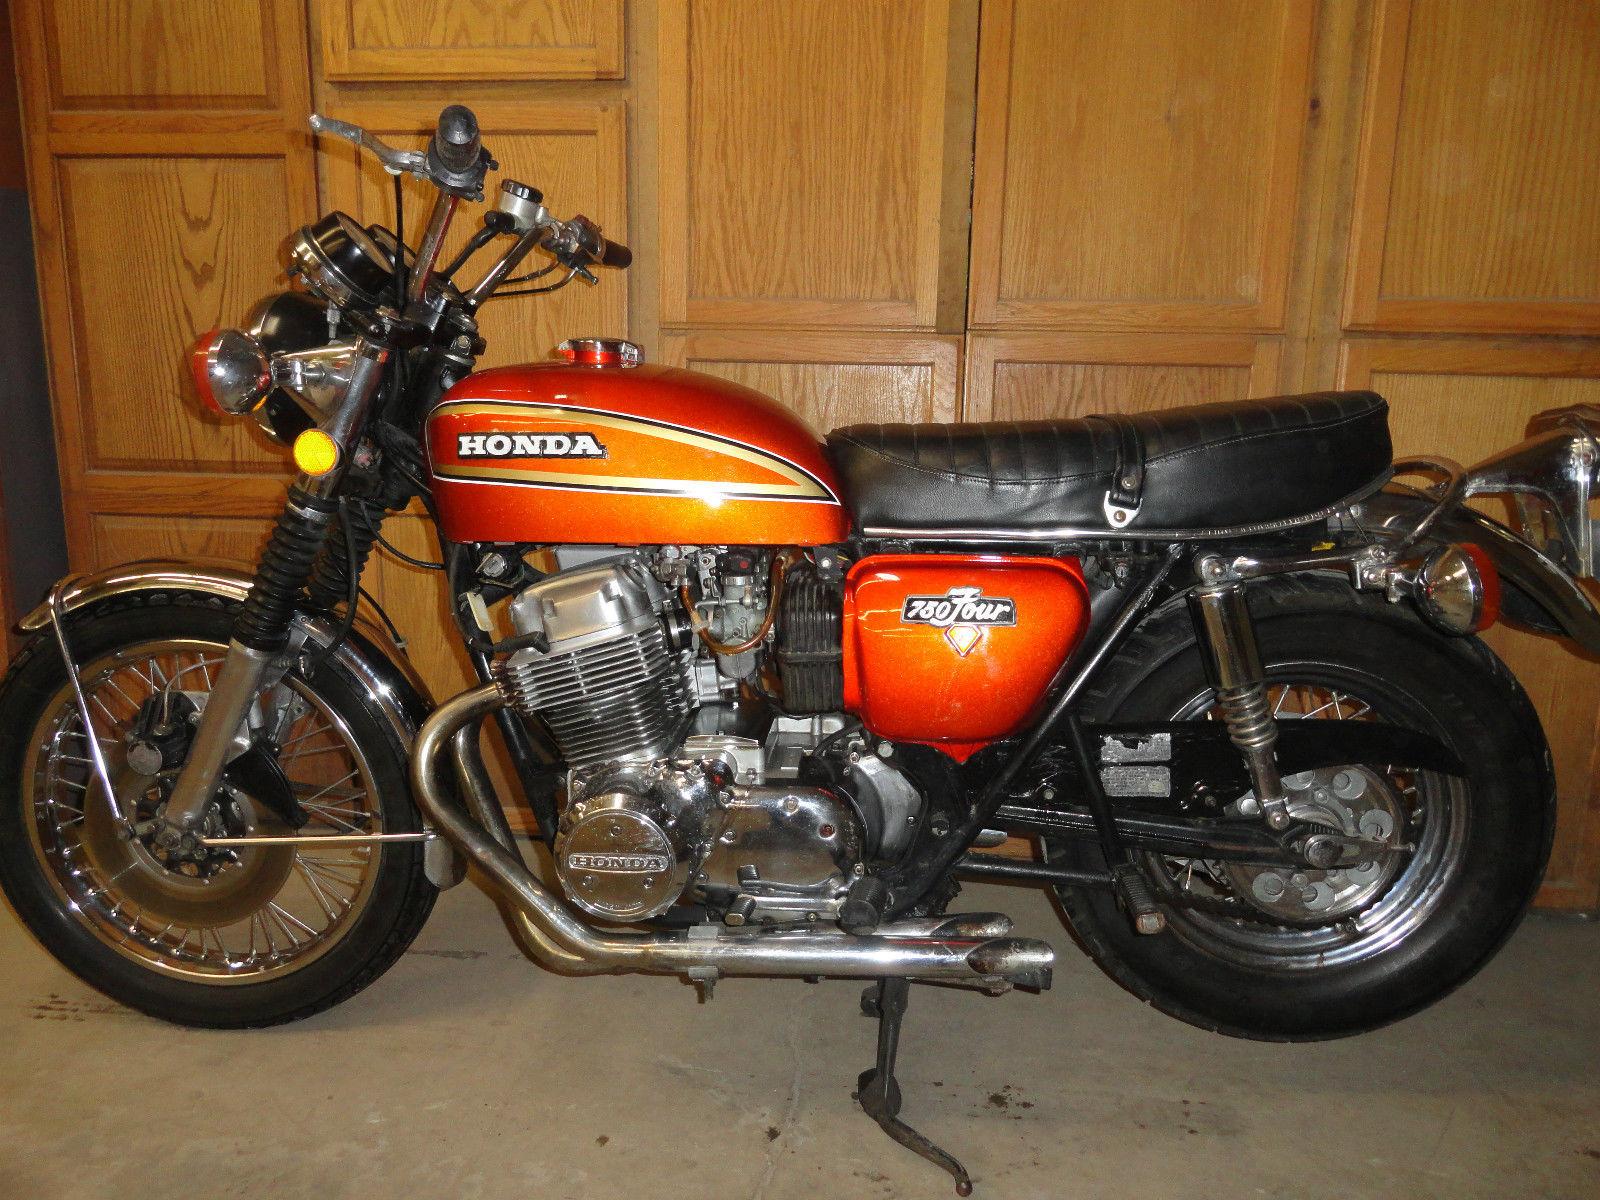 1975 honda cb750 sunburst orange low miles publicscrutiny Choice Image